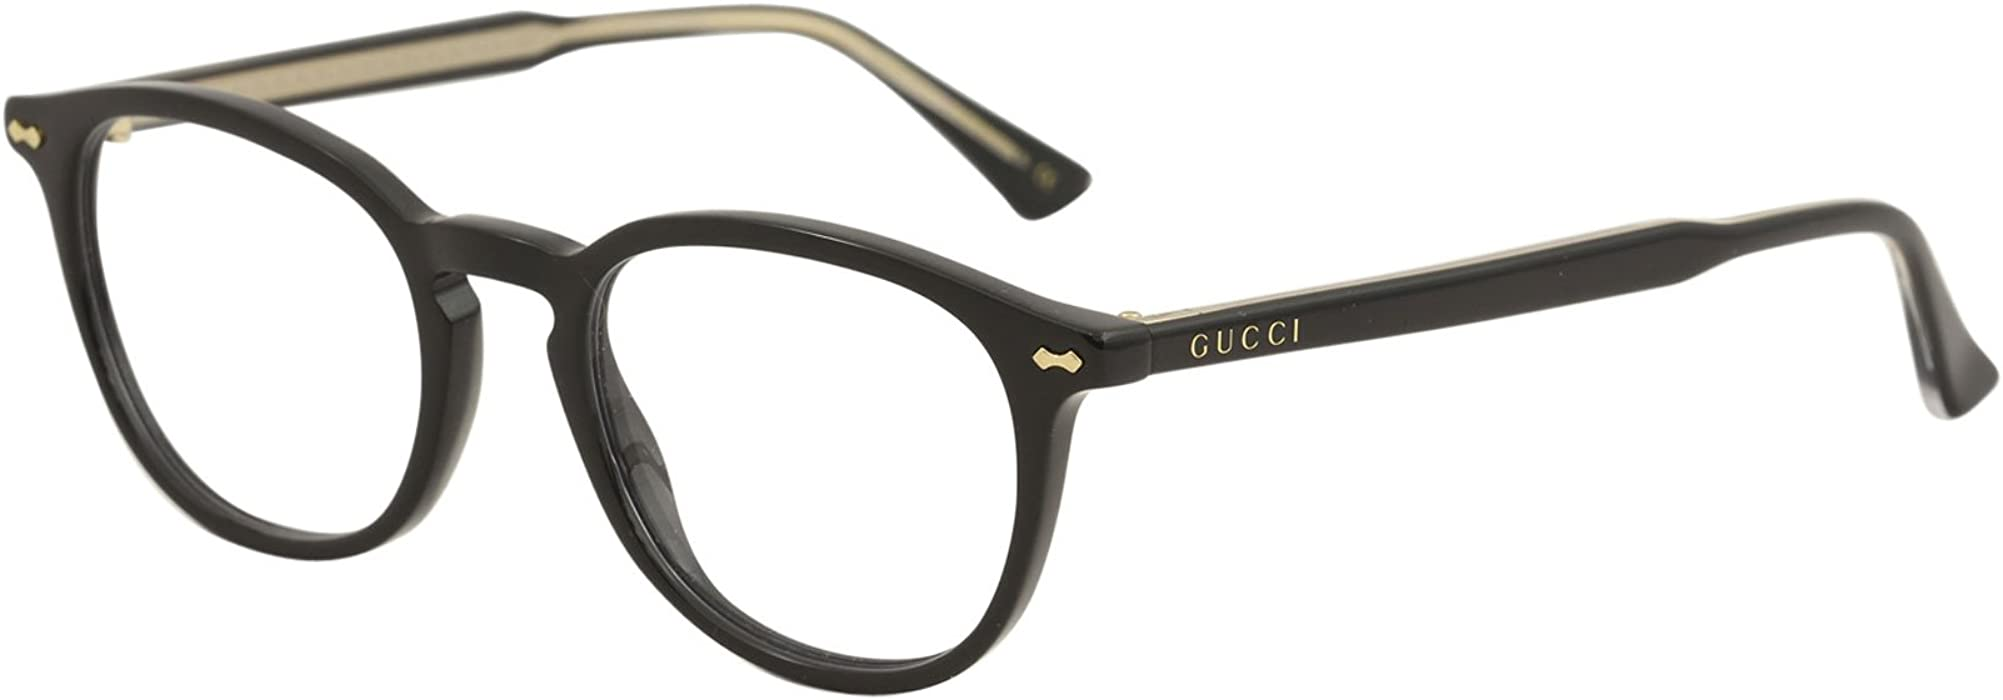 83ec8546681 GG0187O Vintage Inspired Panthos Style Eyeglasses 49mm. Eyeglasses Gucci GG  0187 O- 005 BLACK